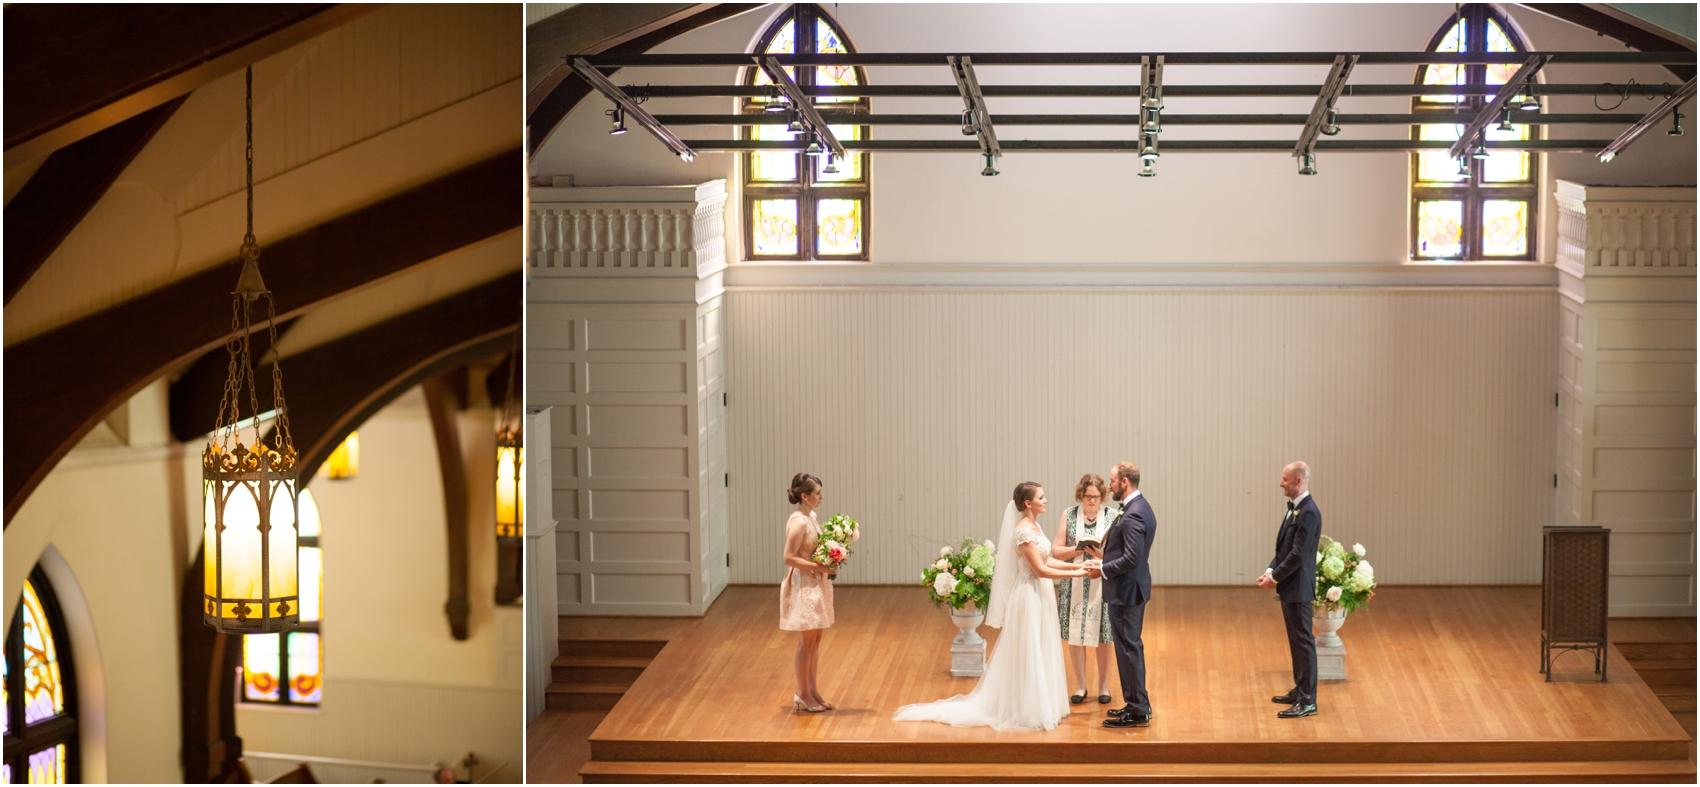 Old-Metropolitan-Hall-Wedding-Charlottesville-Virginia-403.jpg